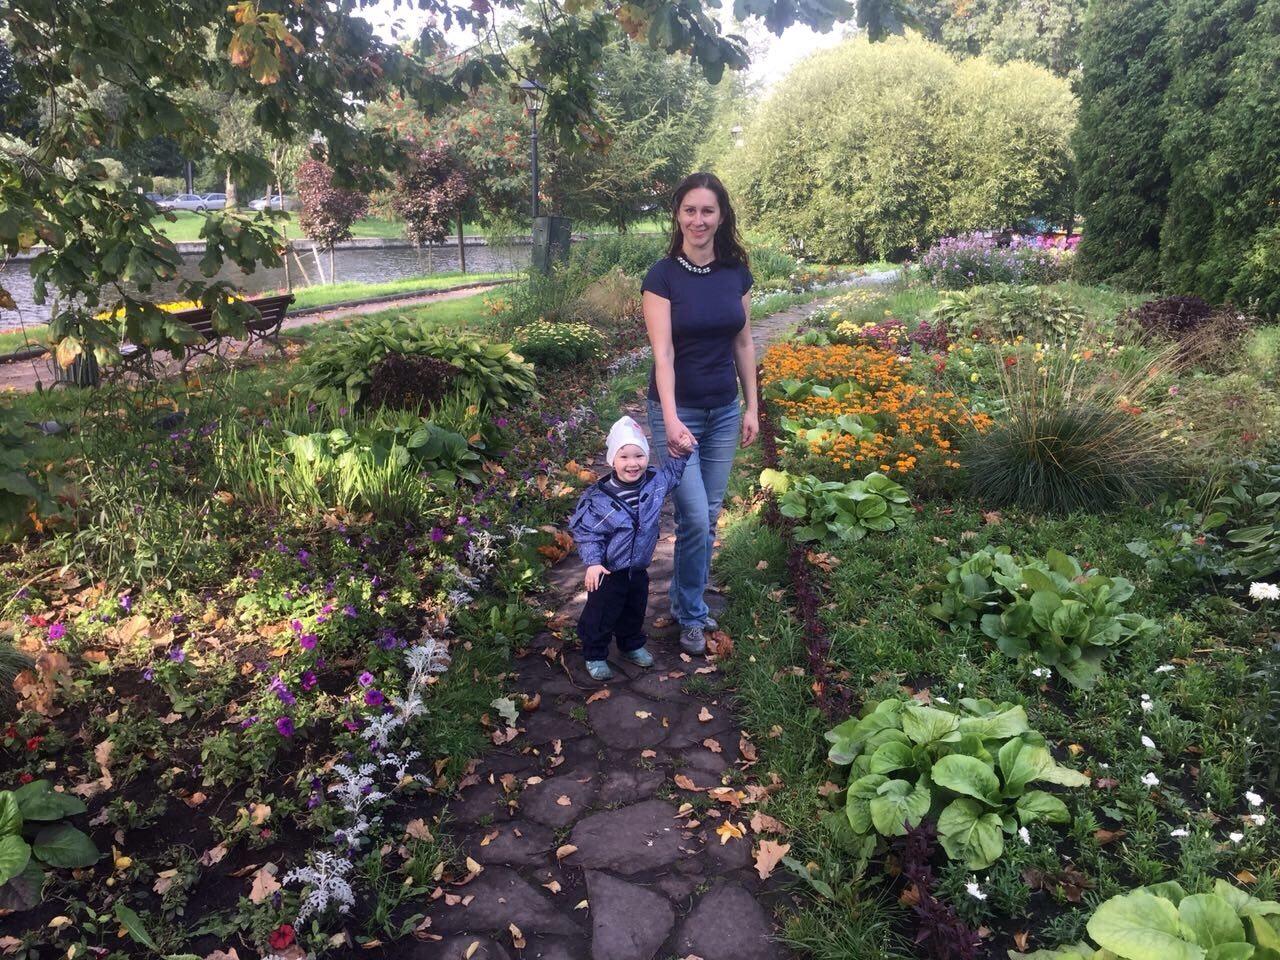 Как красиво в парке, сентябрьским утром! г Спб . Краски осени